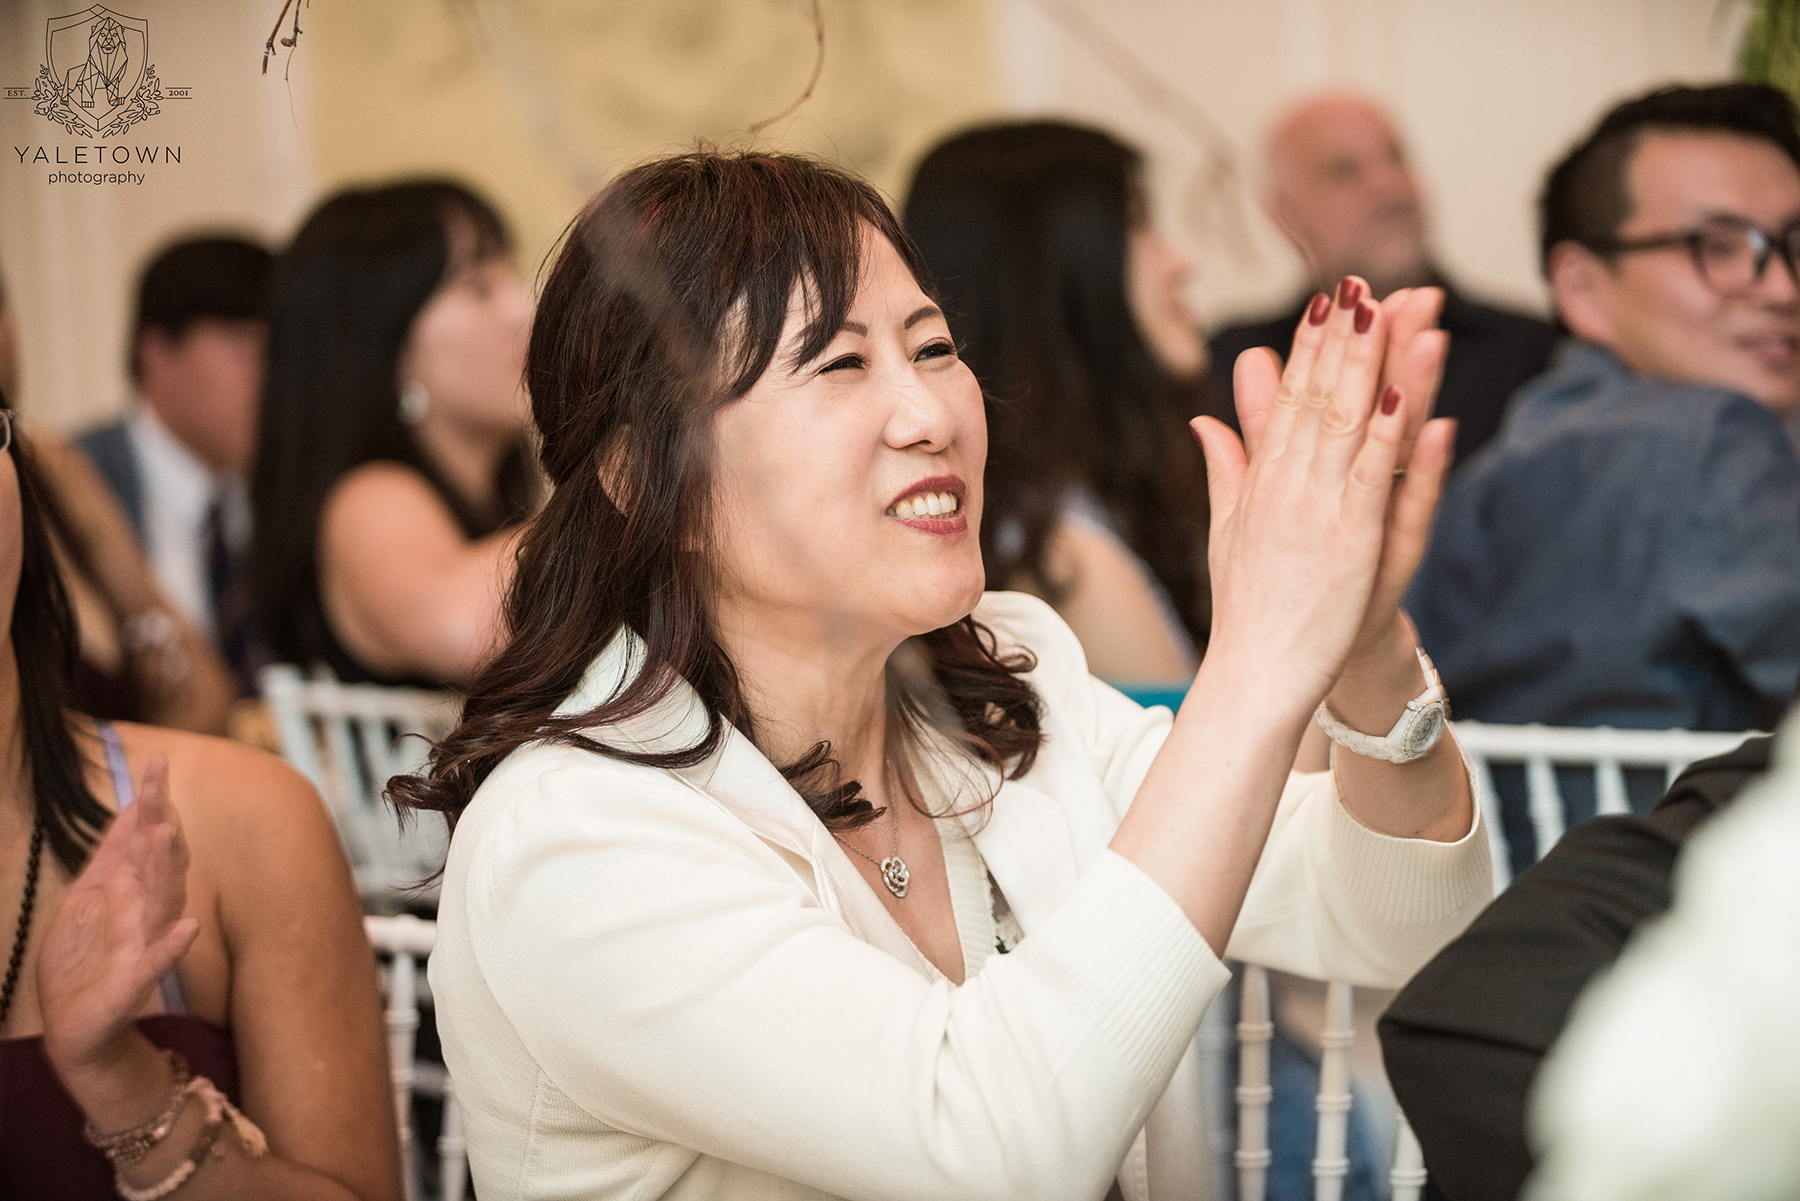 Wedding-Reception-Speeches-Rosewood-Hotel-Georgia-Vancouver-Wedding-Yaletown-Photography-photo